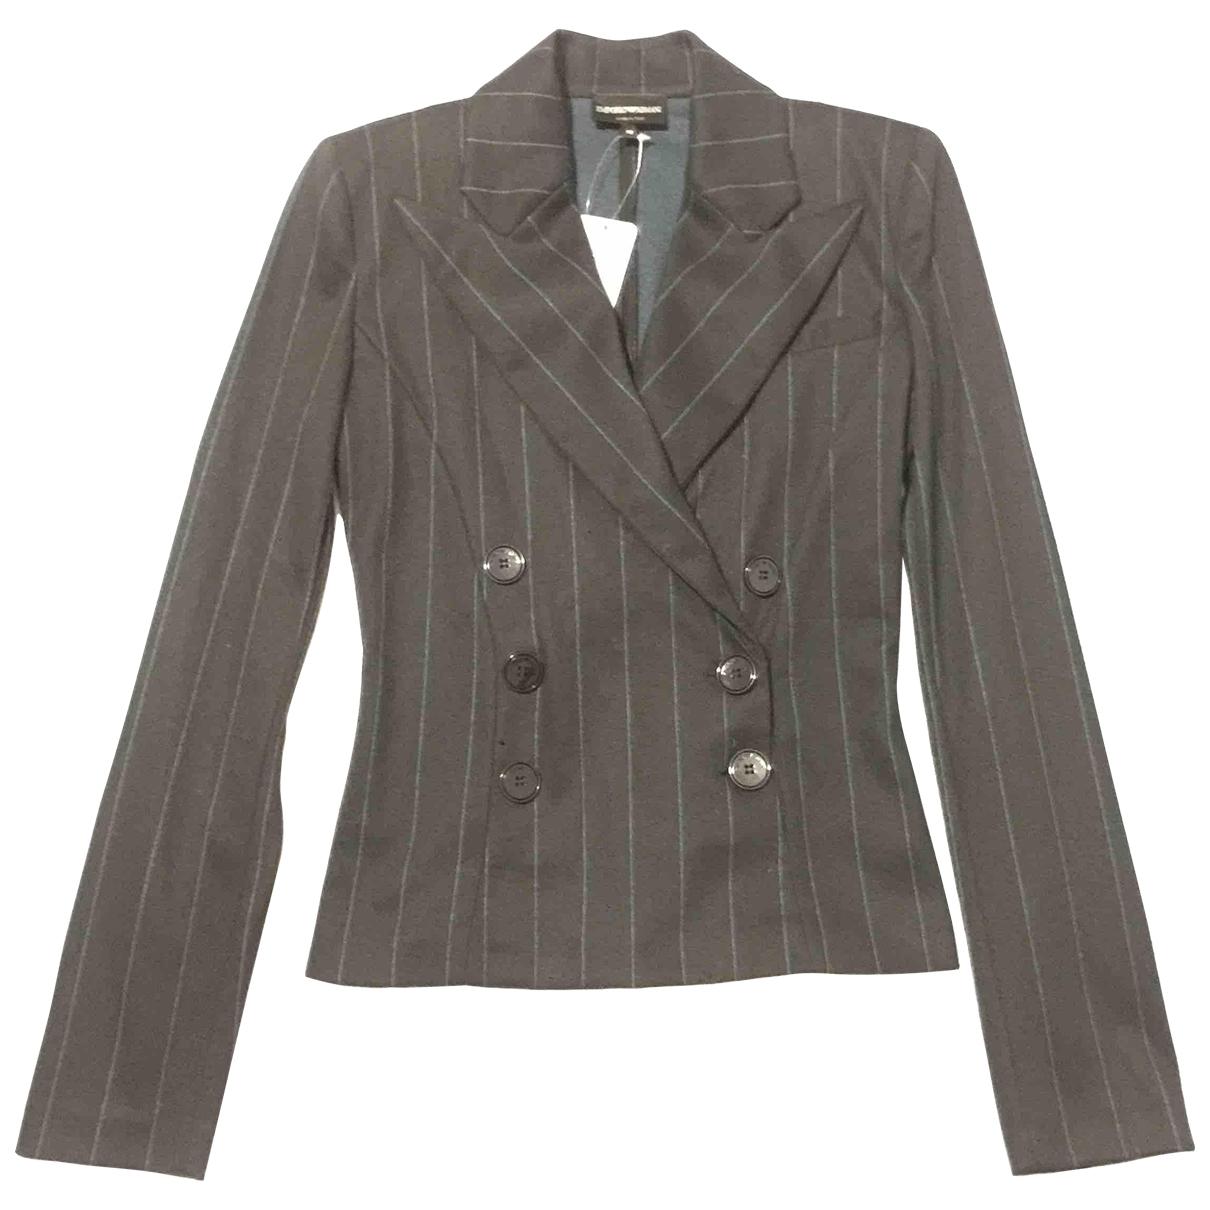 Emporio Armani \N Multicolour jacket for Women 40 IT